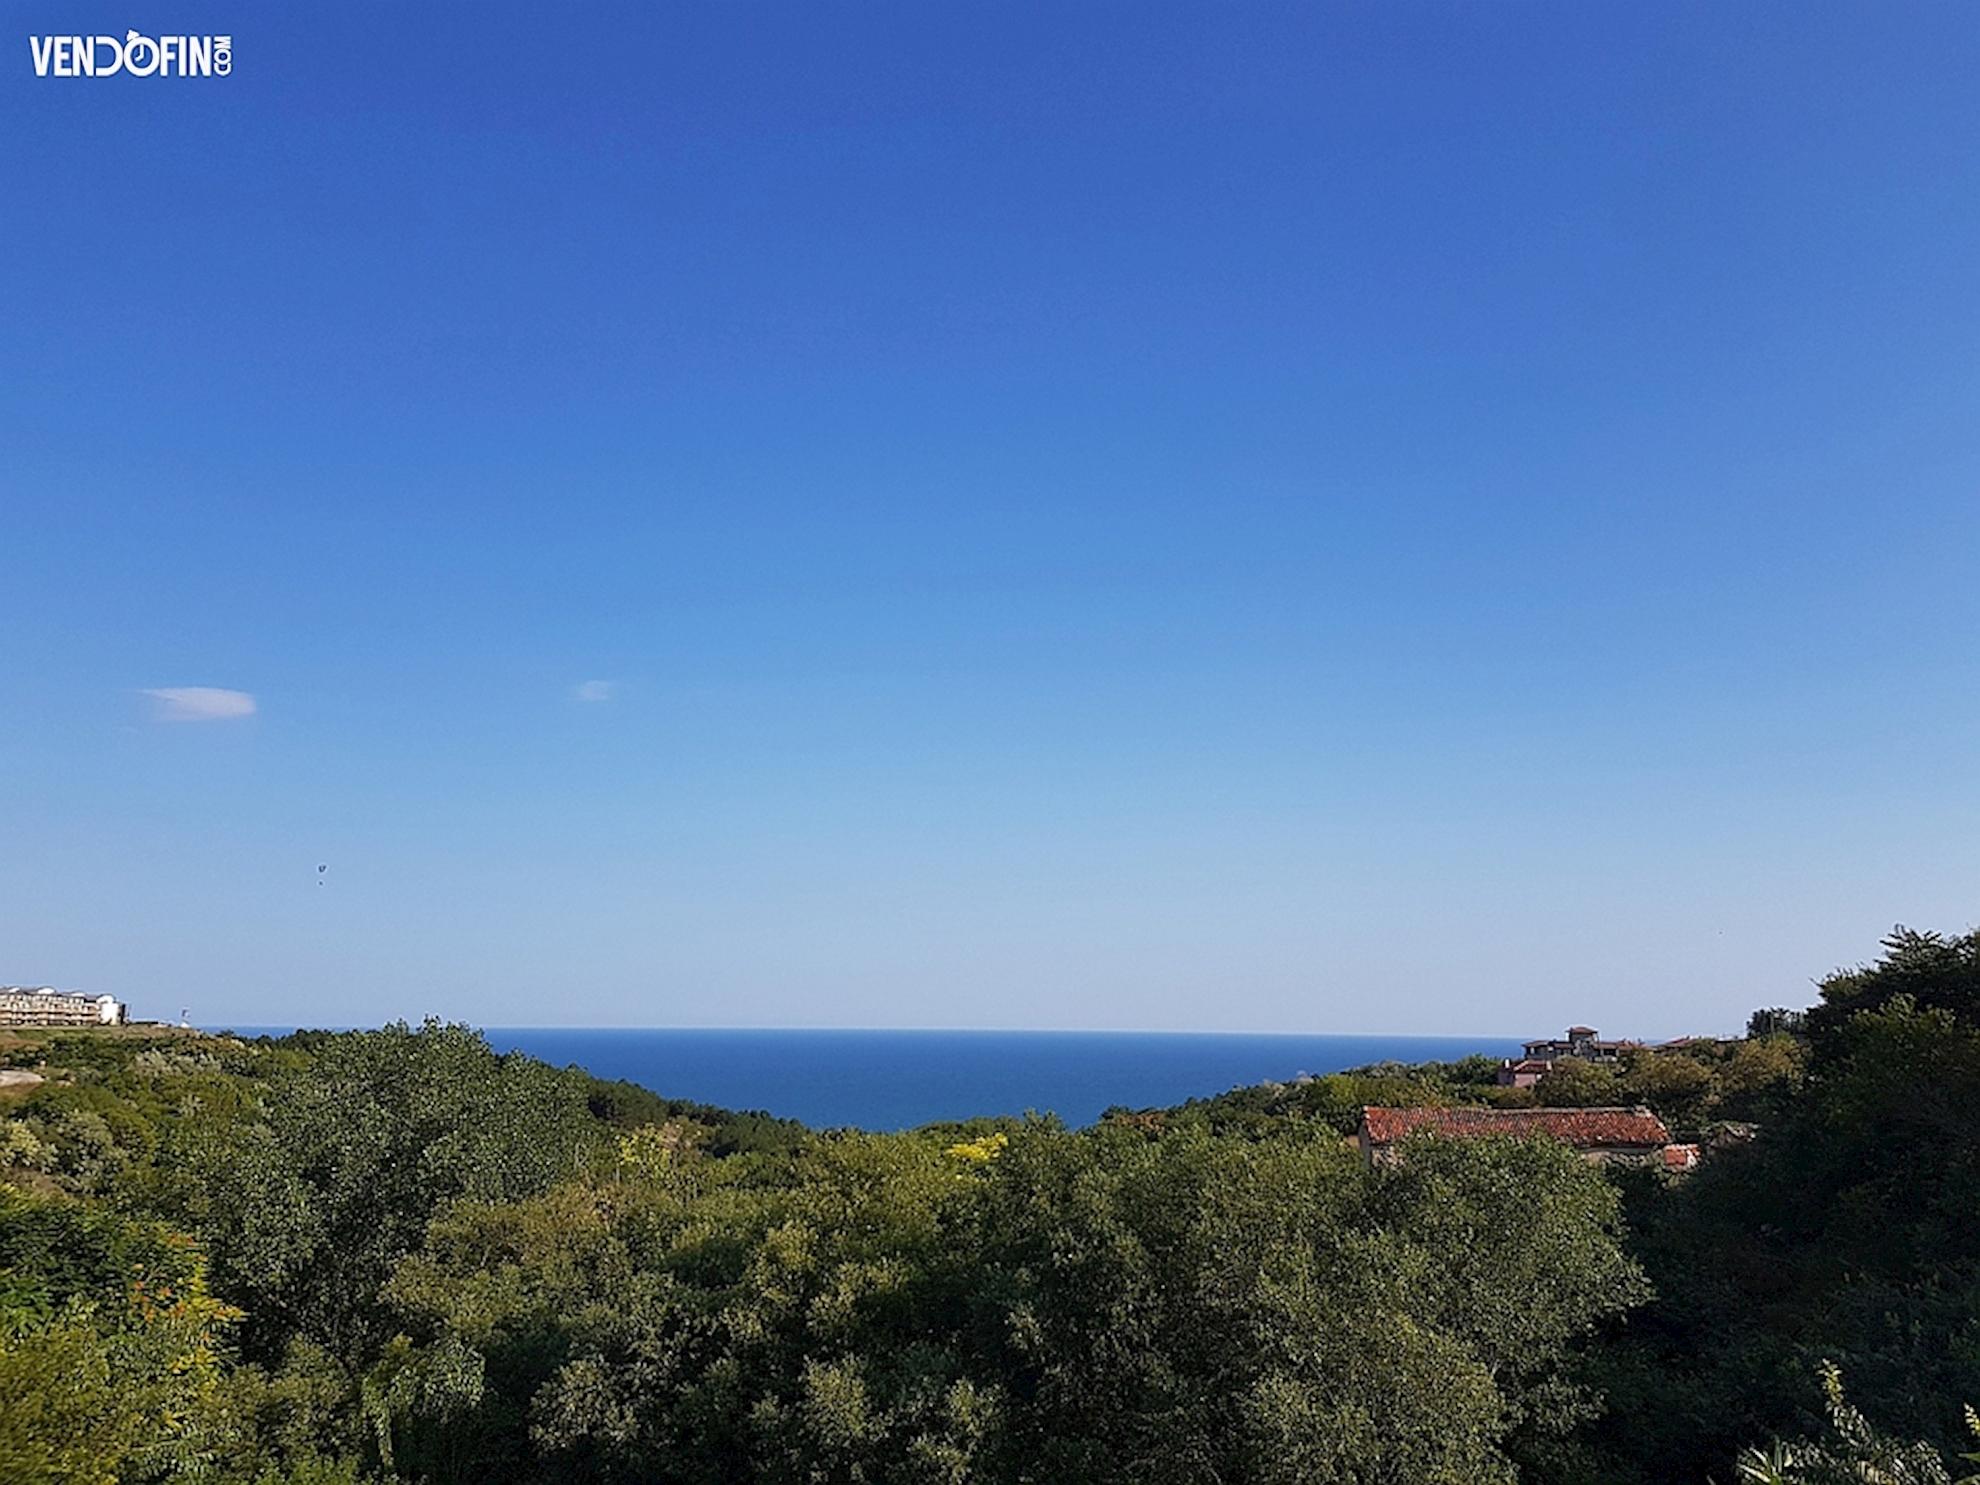 sea_view_topola.jpg